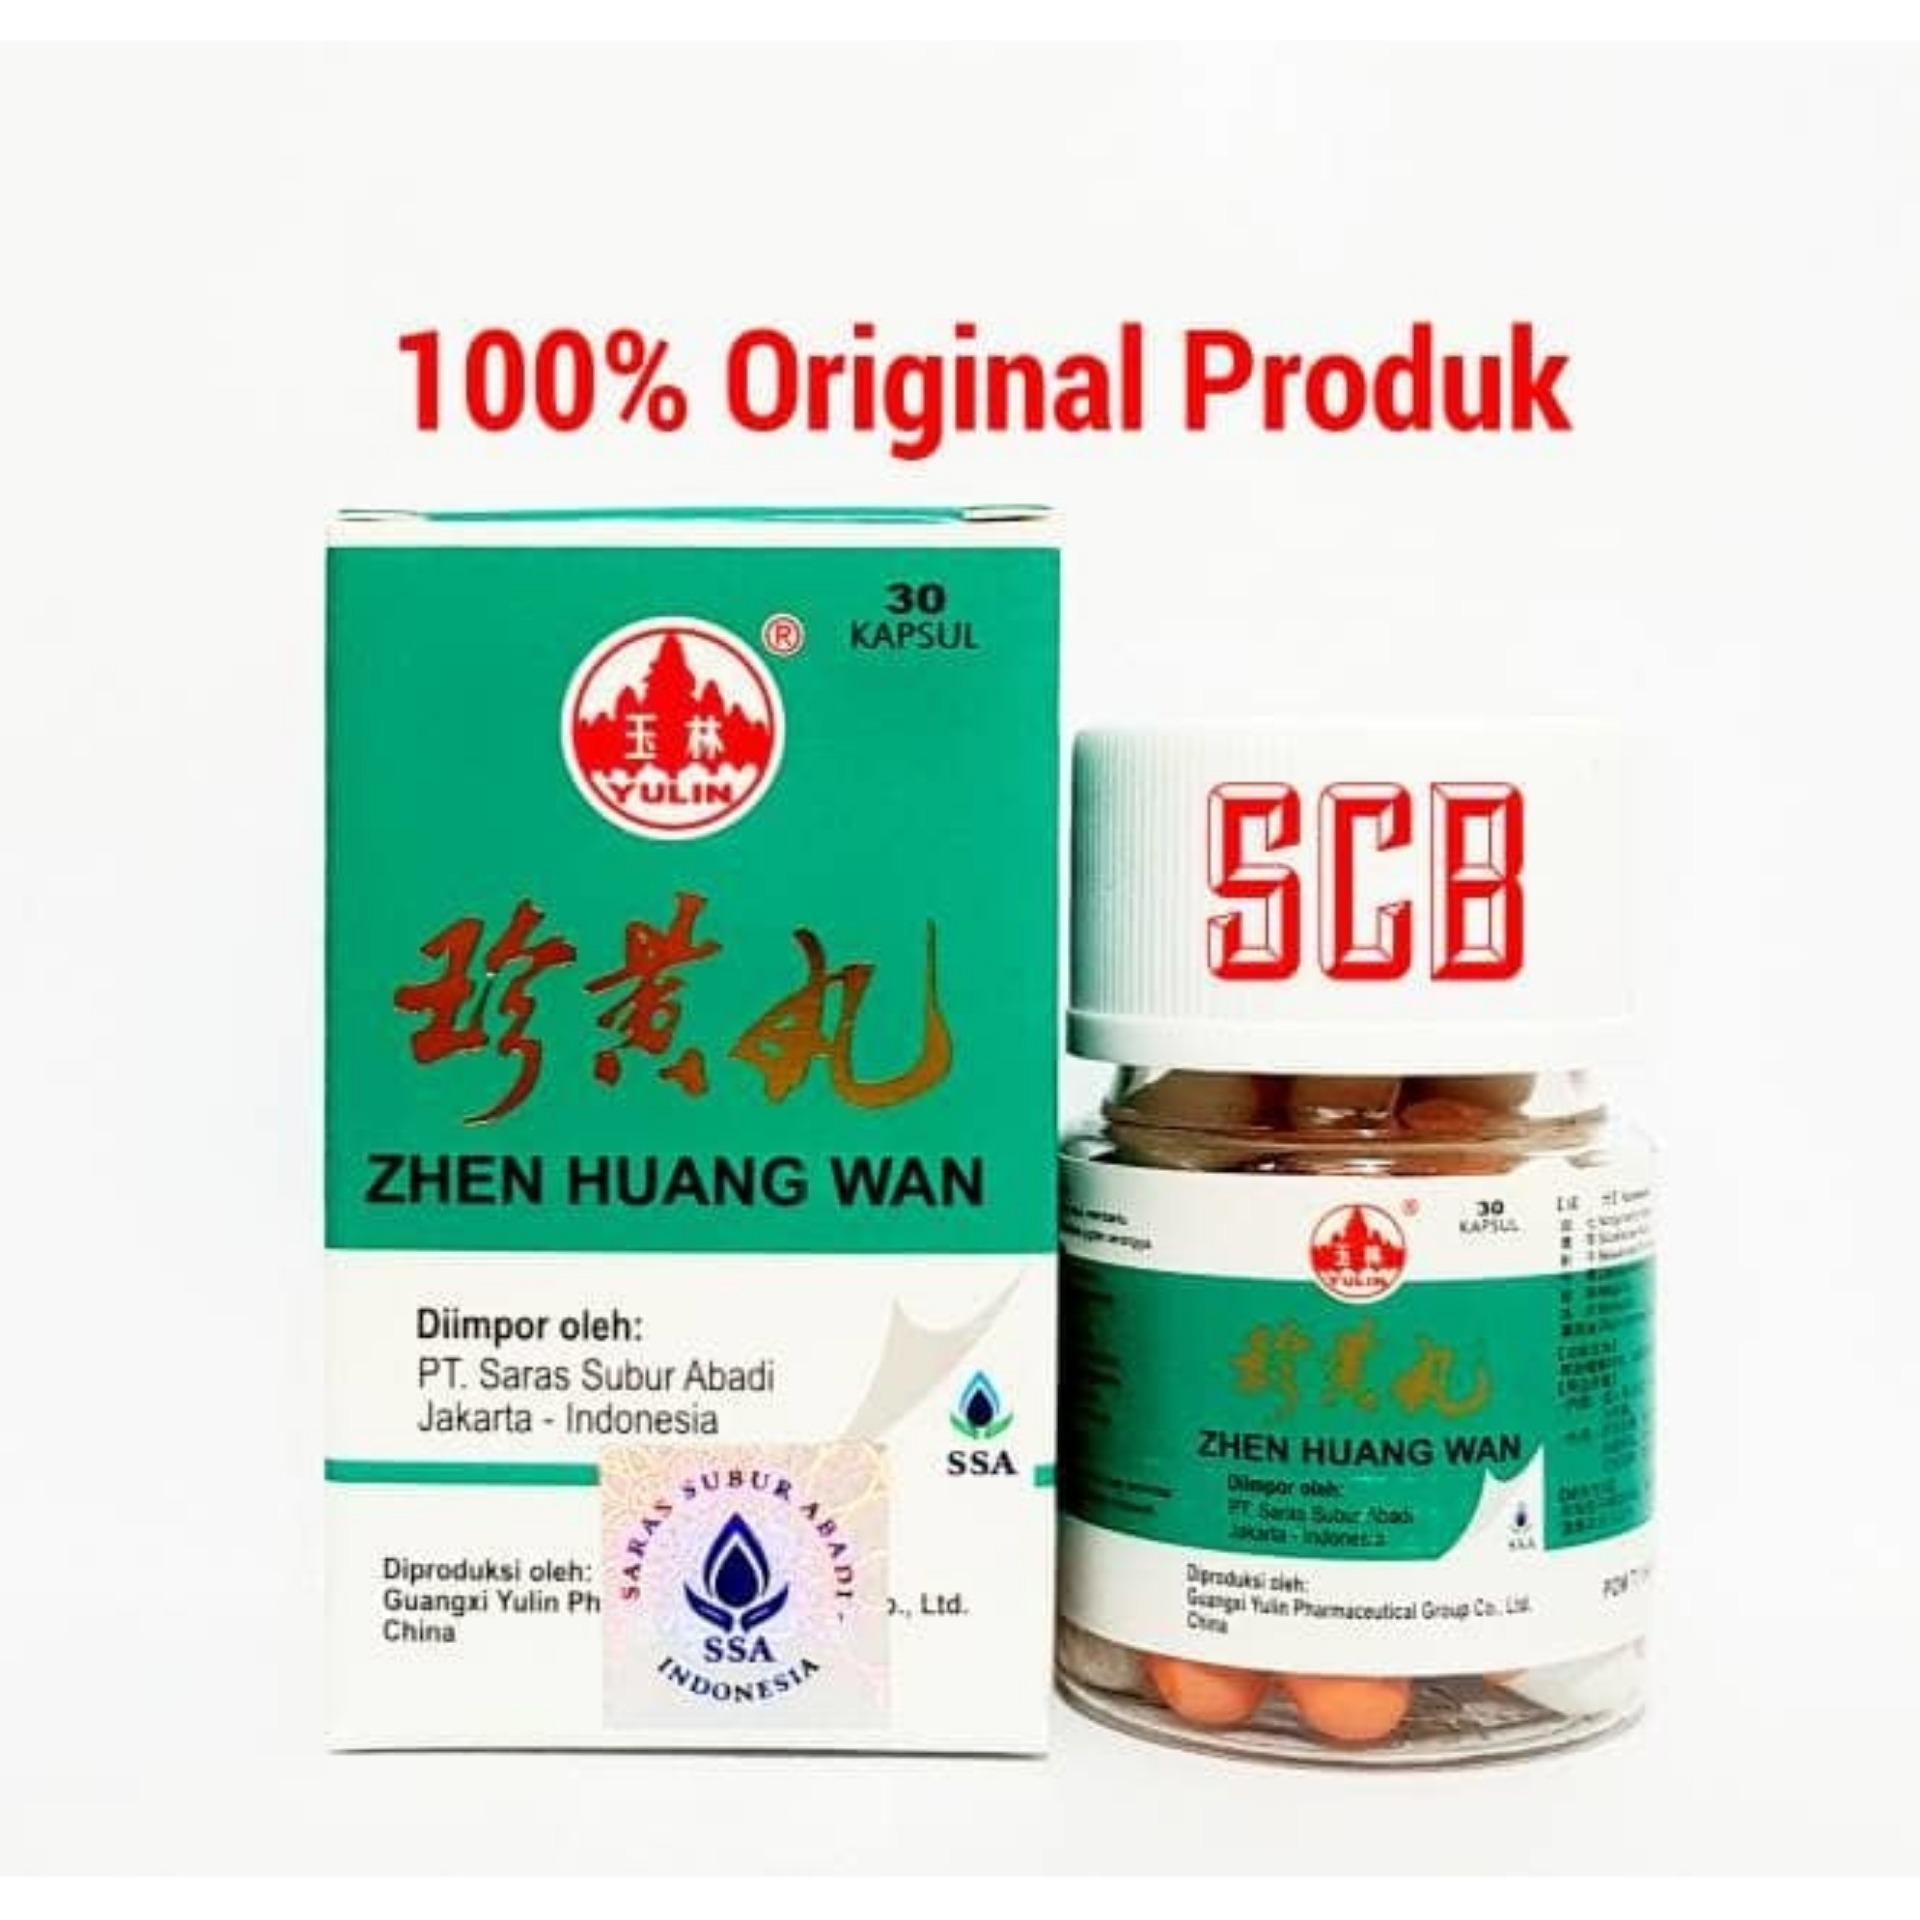 Ini Harga Ching Wan Huang Terbaru Kini Obat Cina An Kung Niu Promozhen Bisul Darah Kotor Borok Gatal